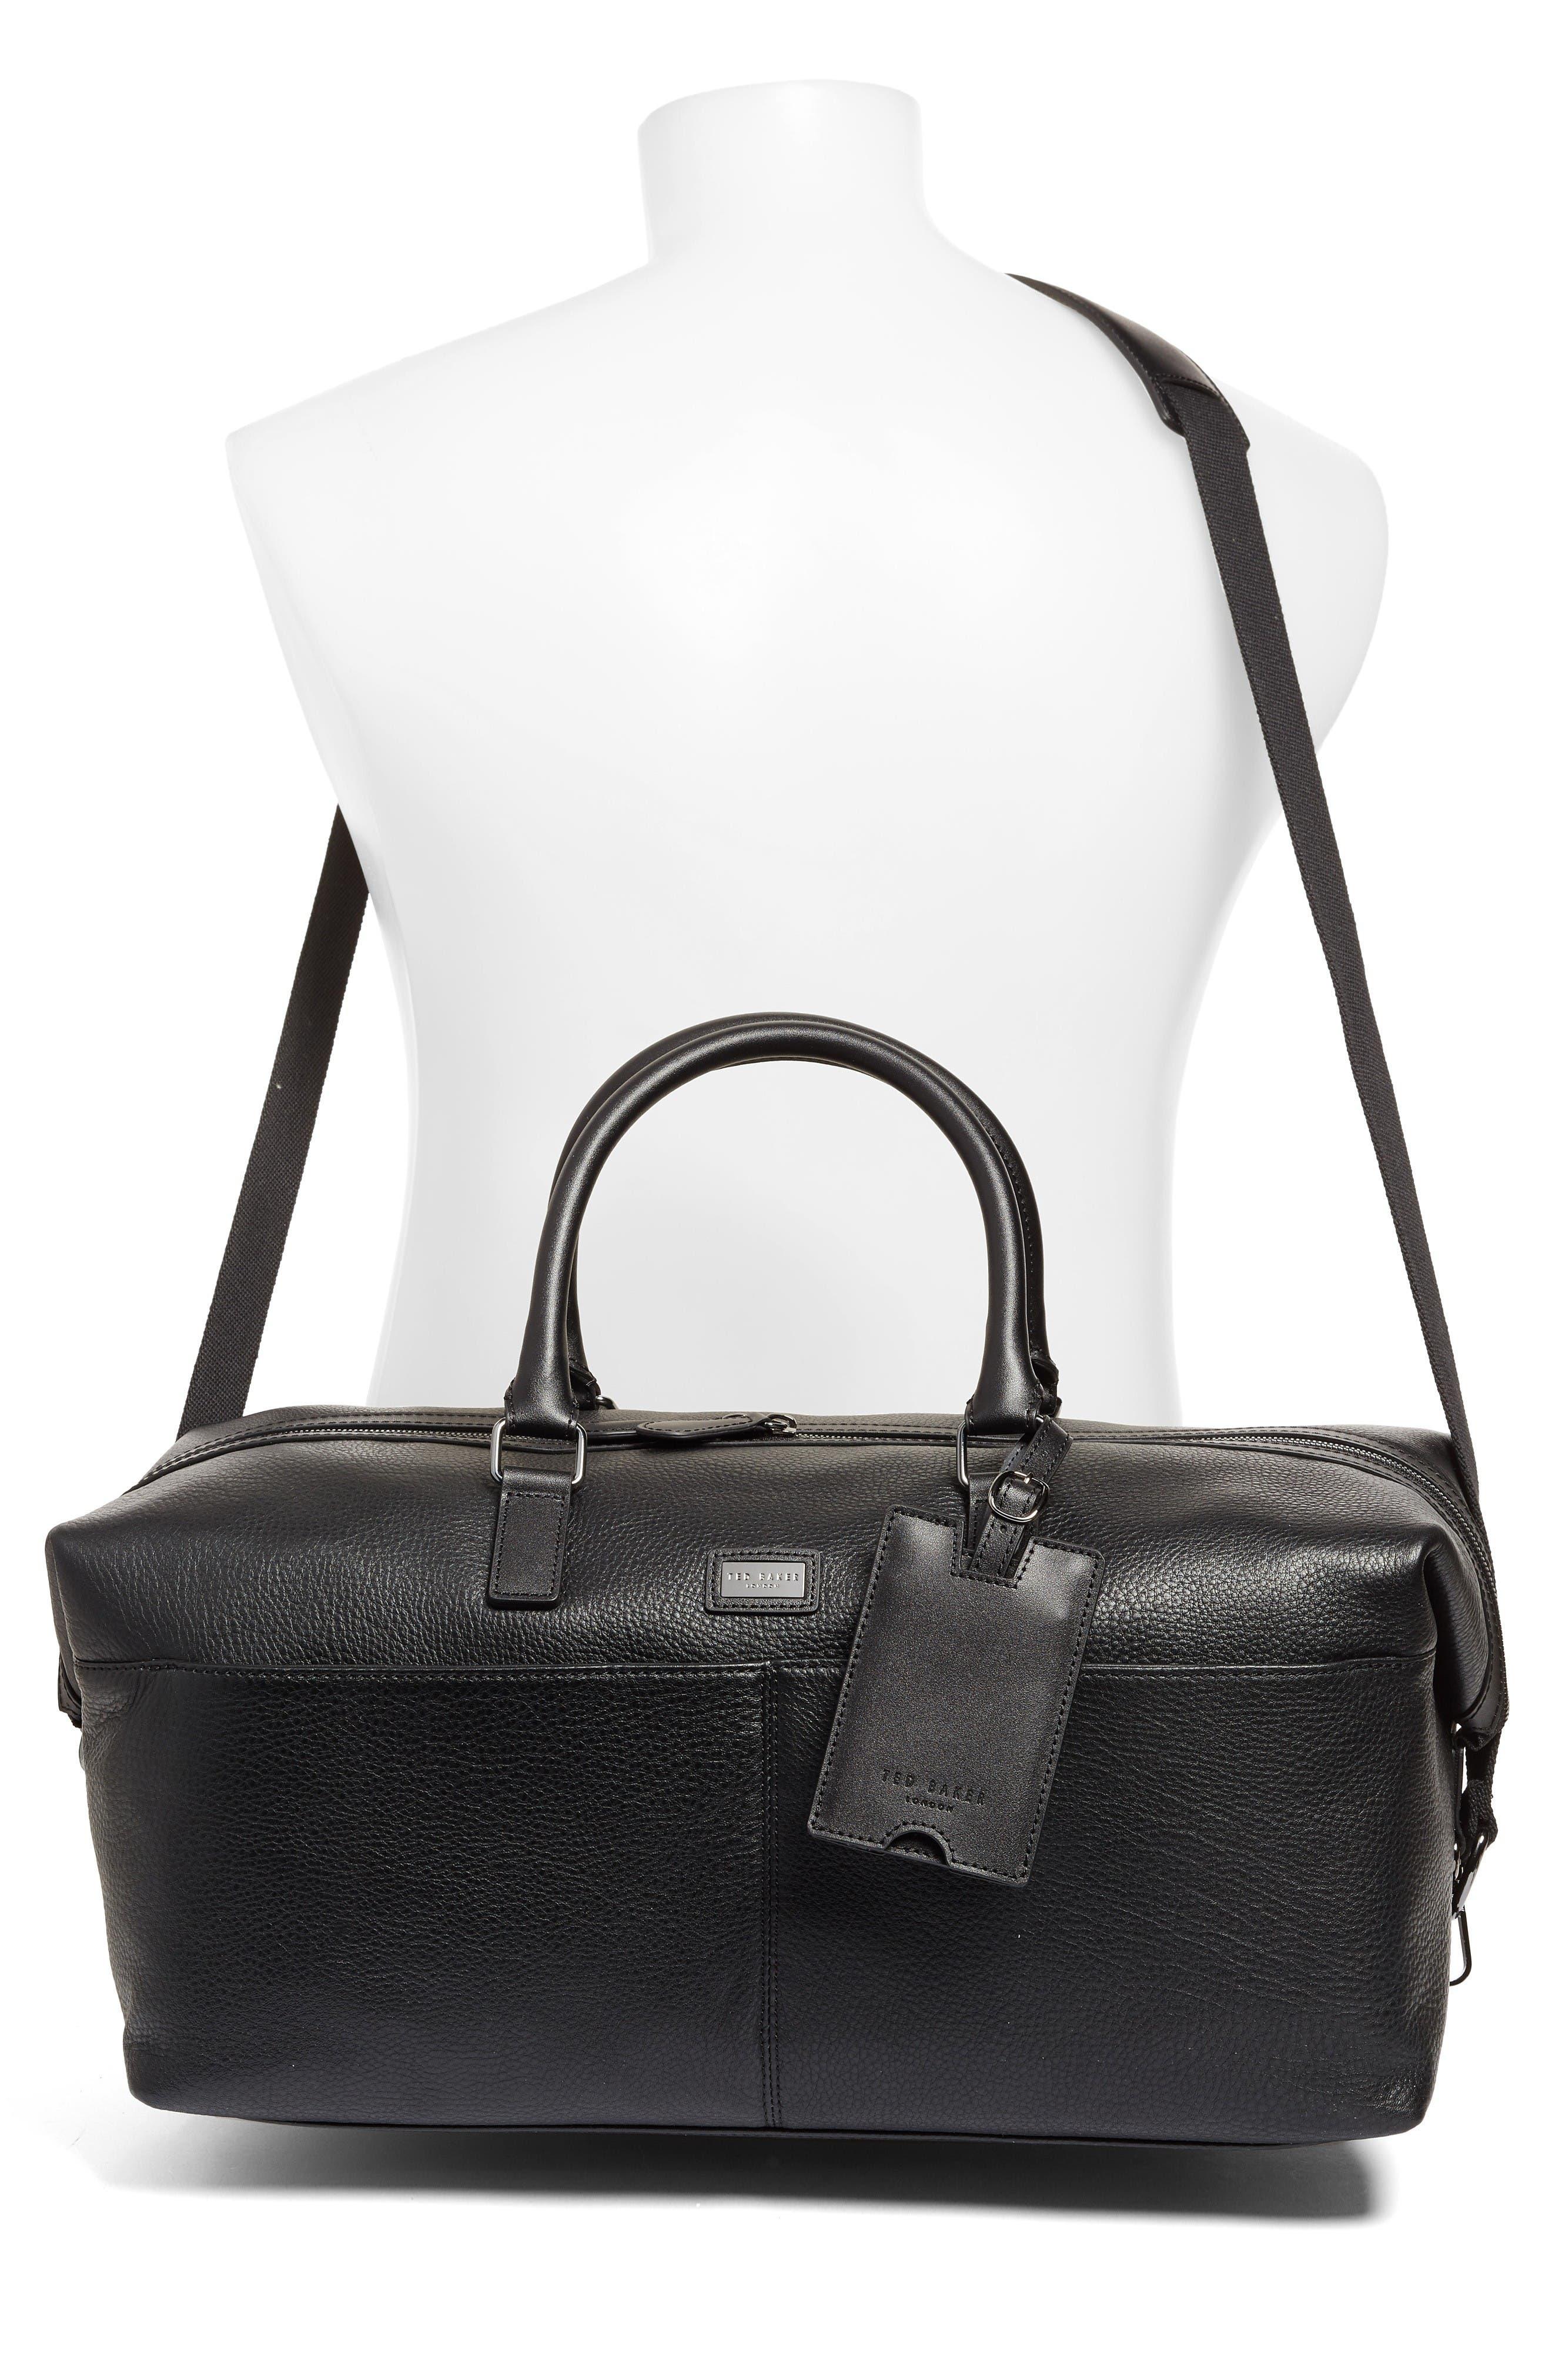 Leather Duffel Bag,                             Alternate thumbnail 2, color,                             Black